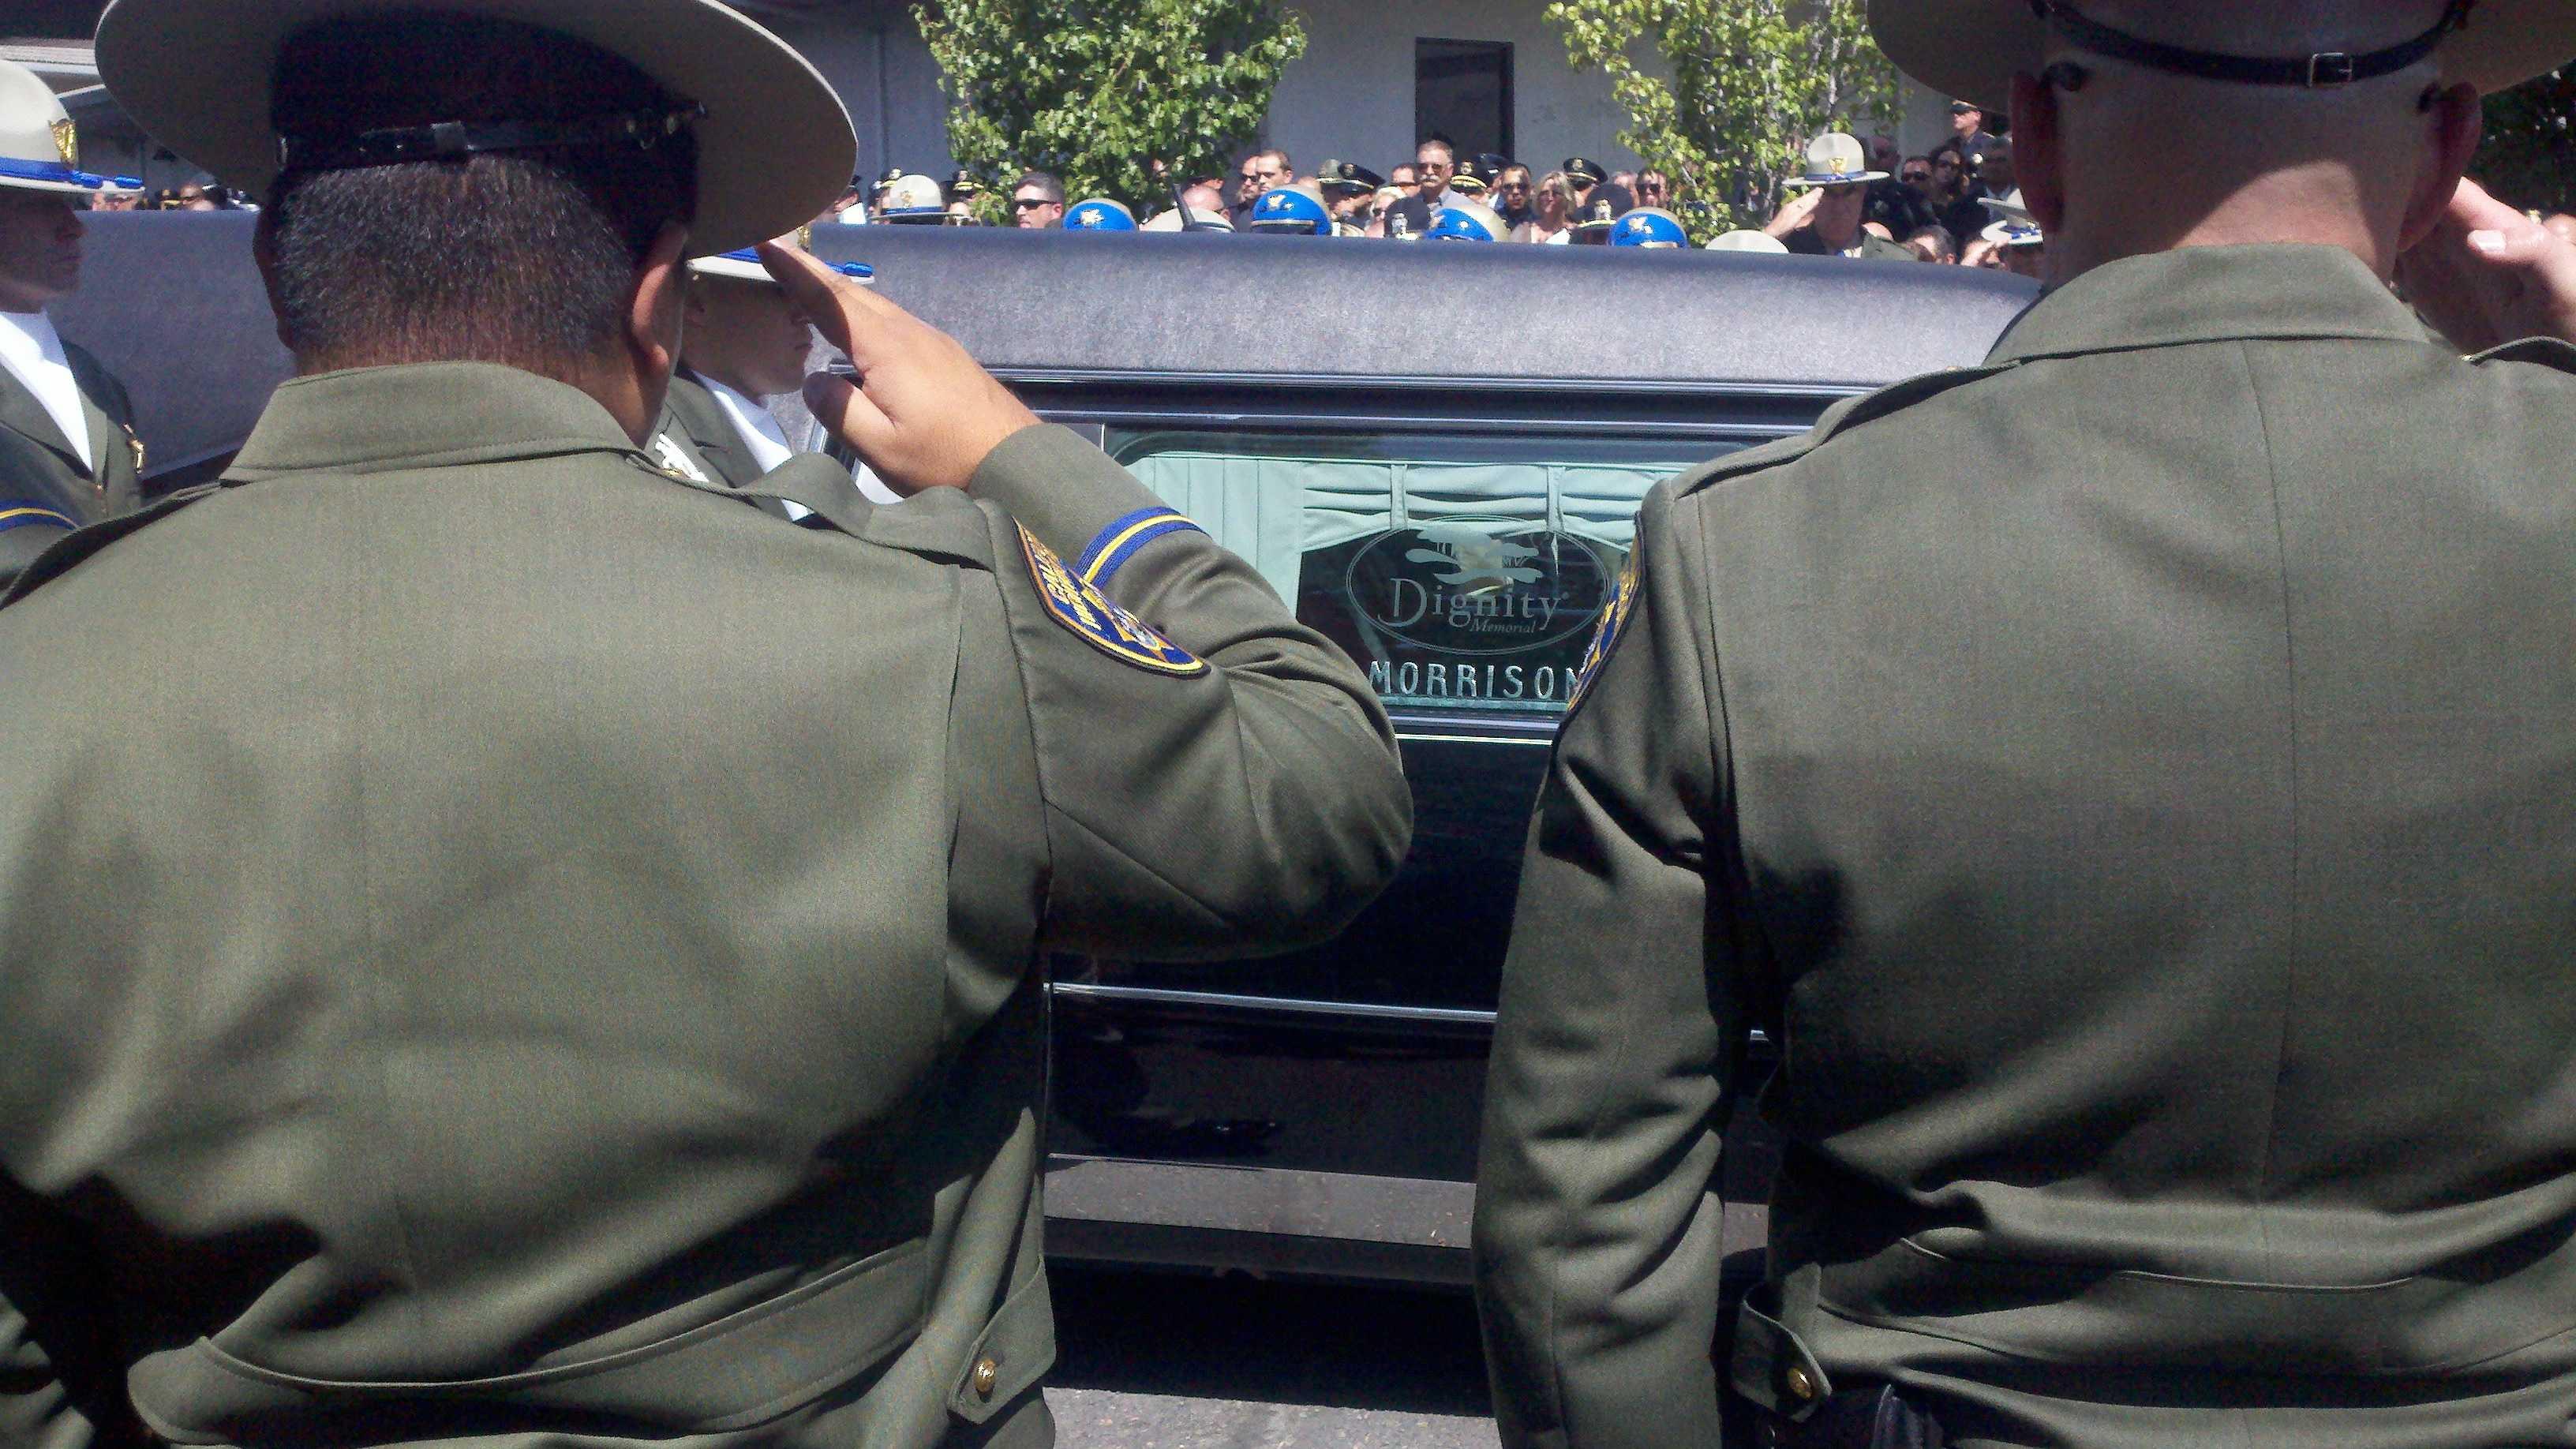 CHP memorial img 29 091312.jpg